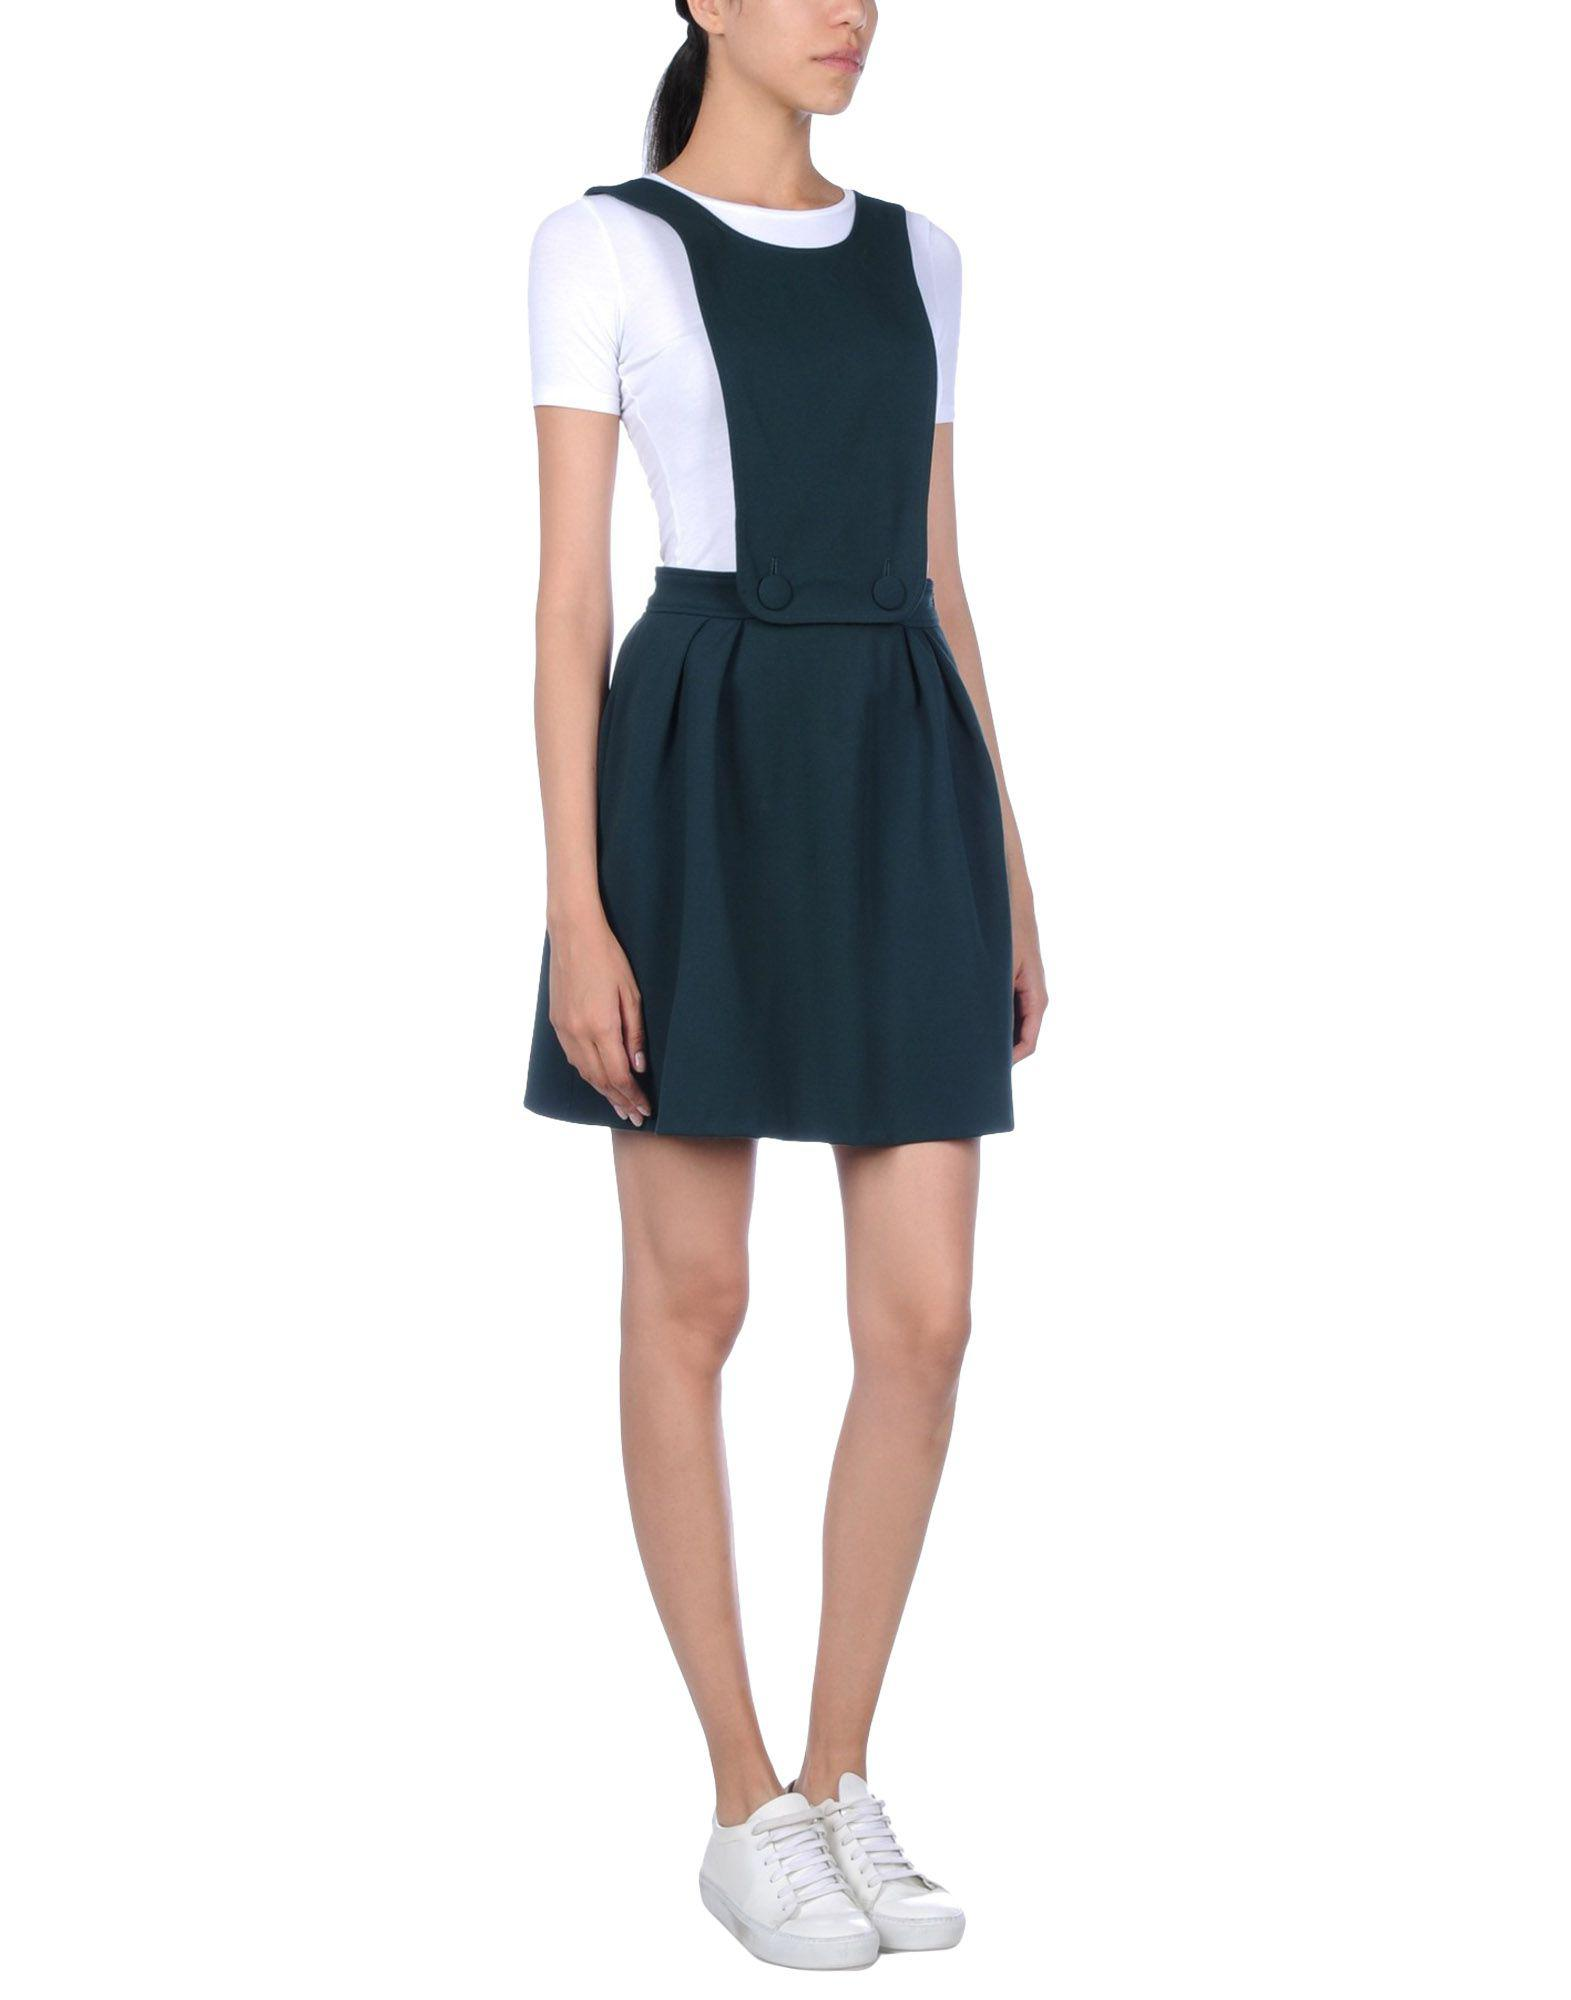 983566fb4b Lyst - Pinko Overall Skirt in Green